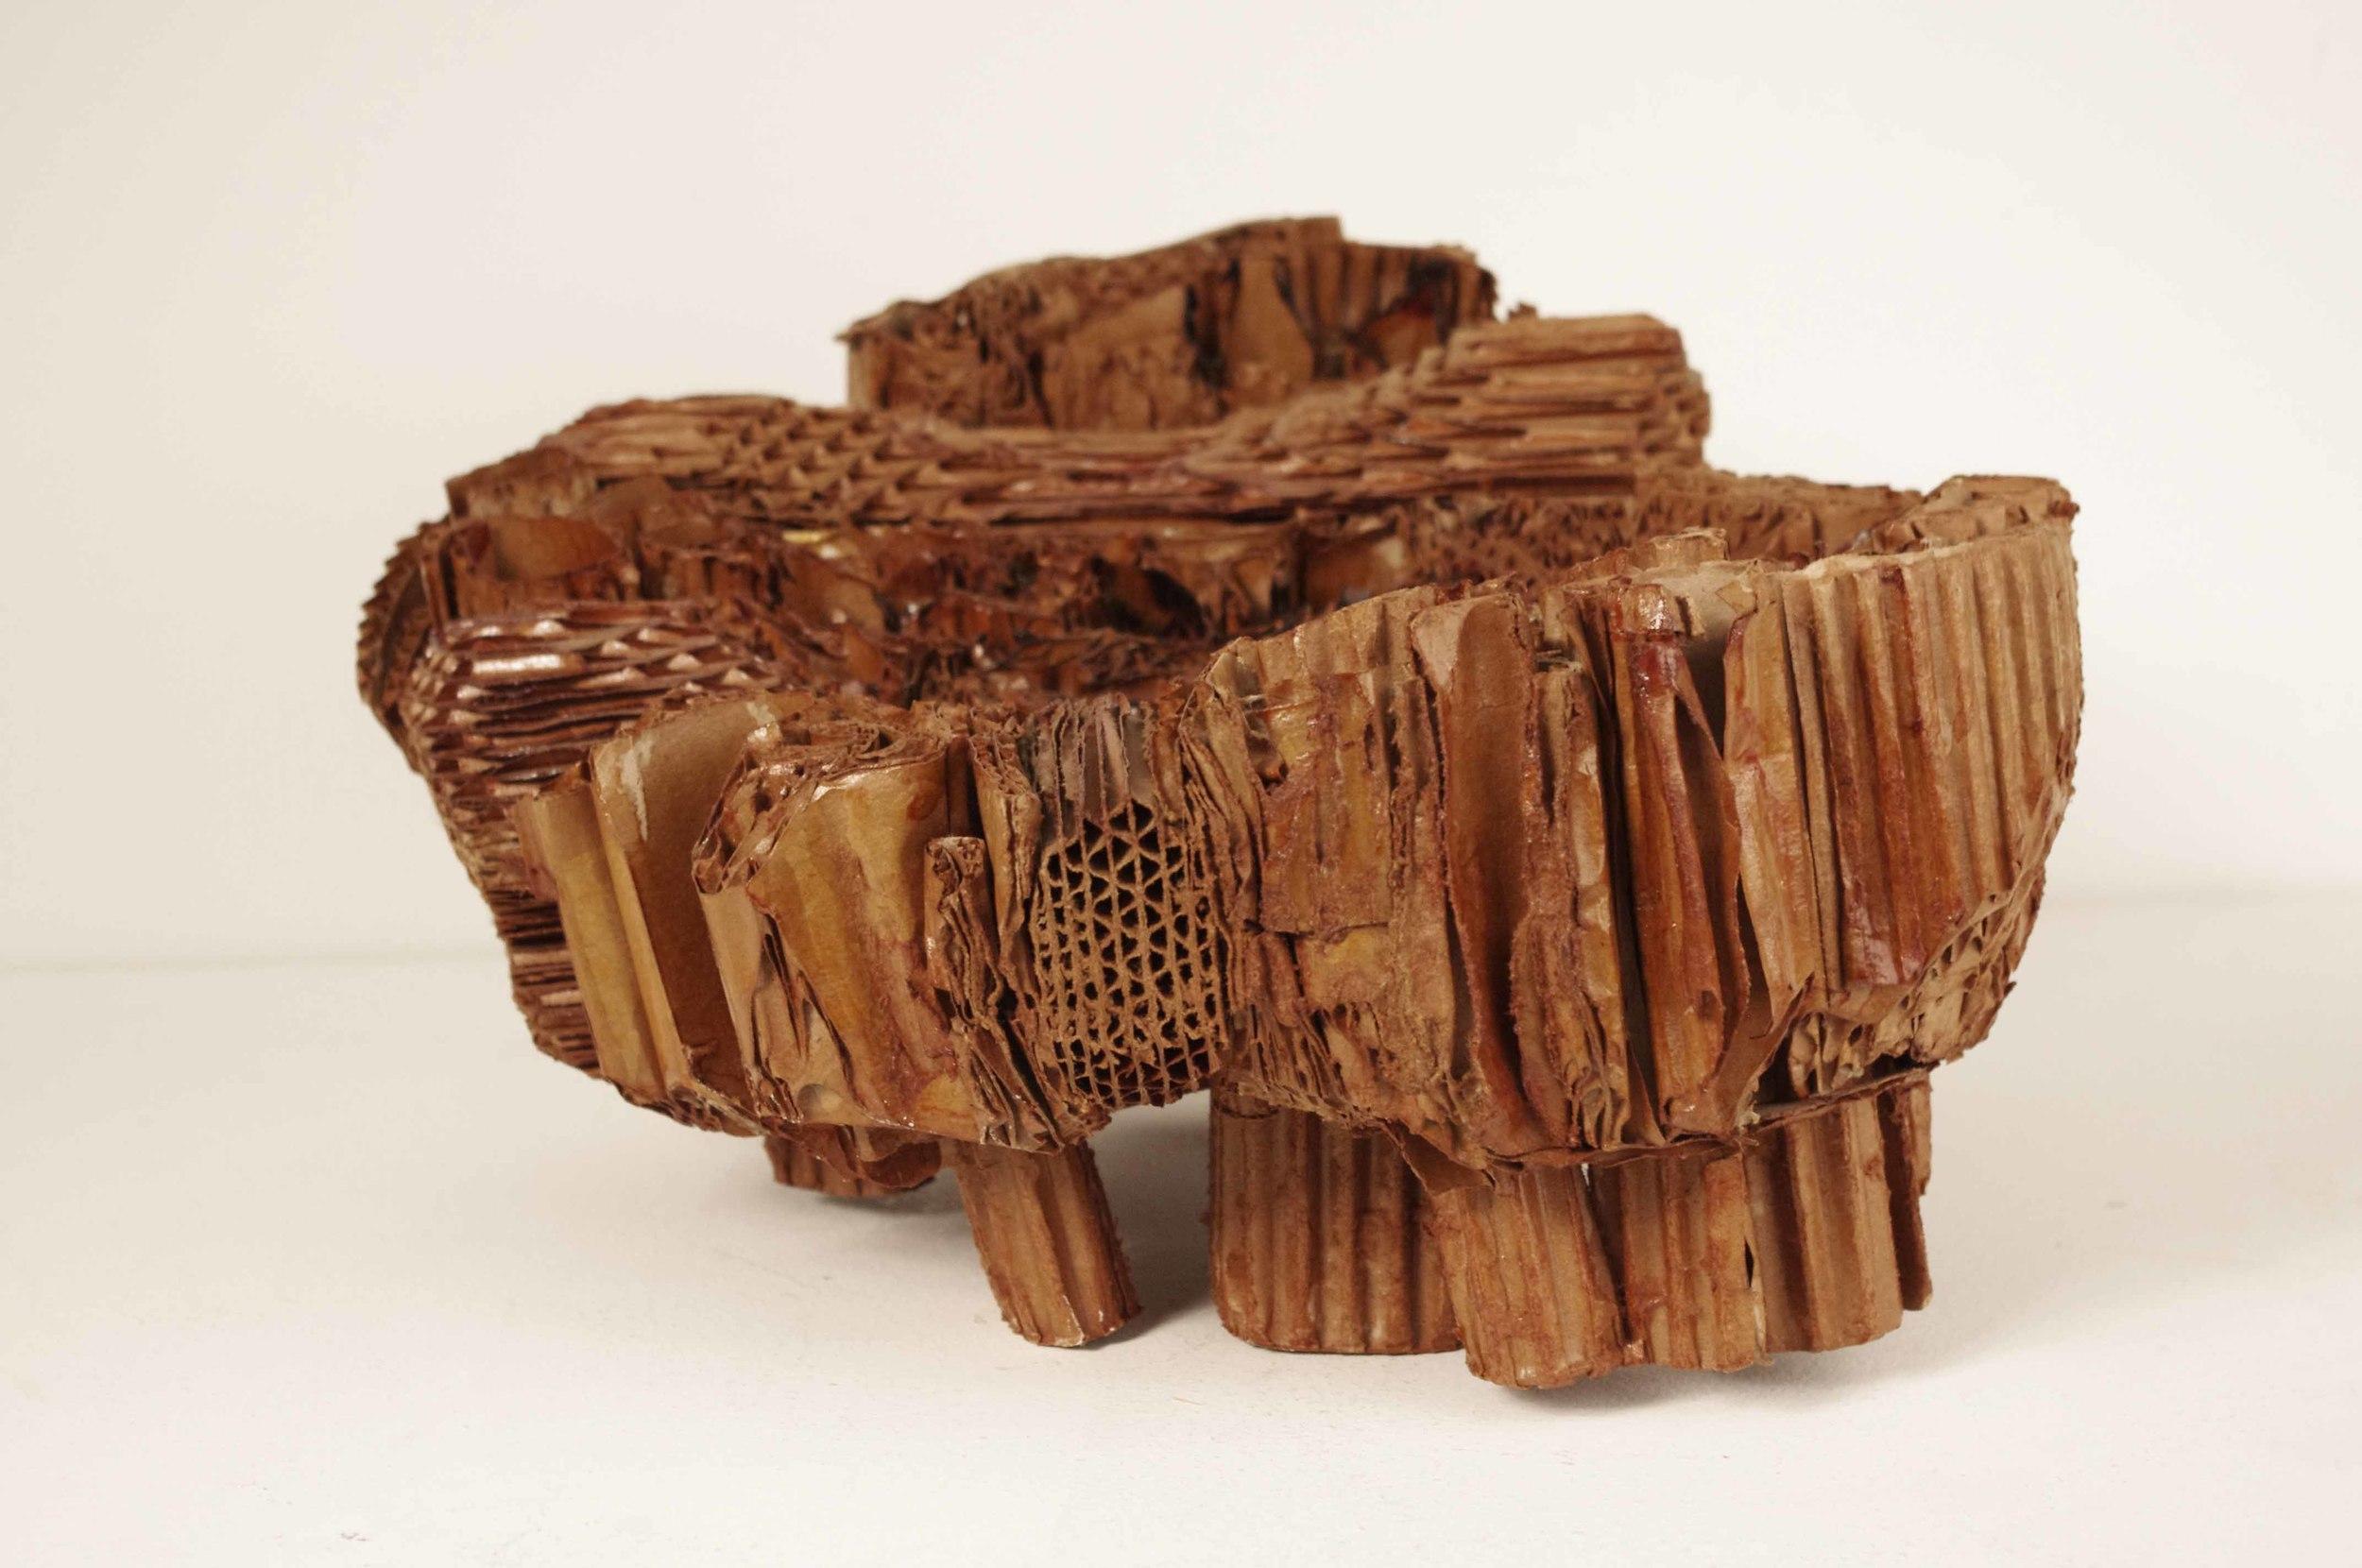 CardboardSculpture2.jpg